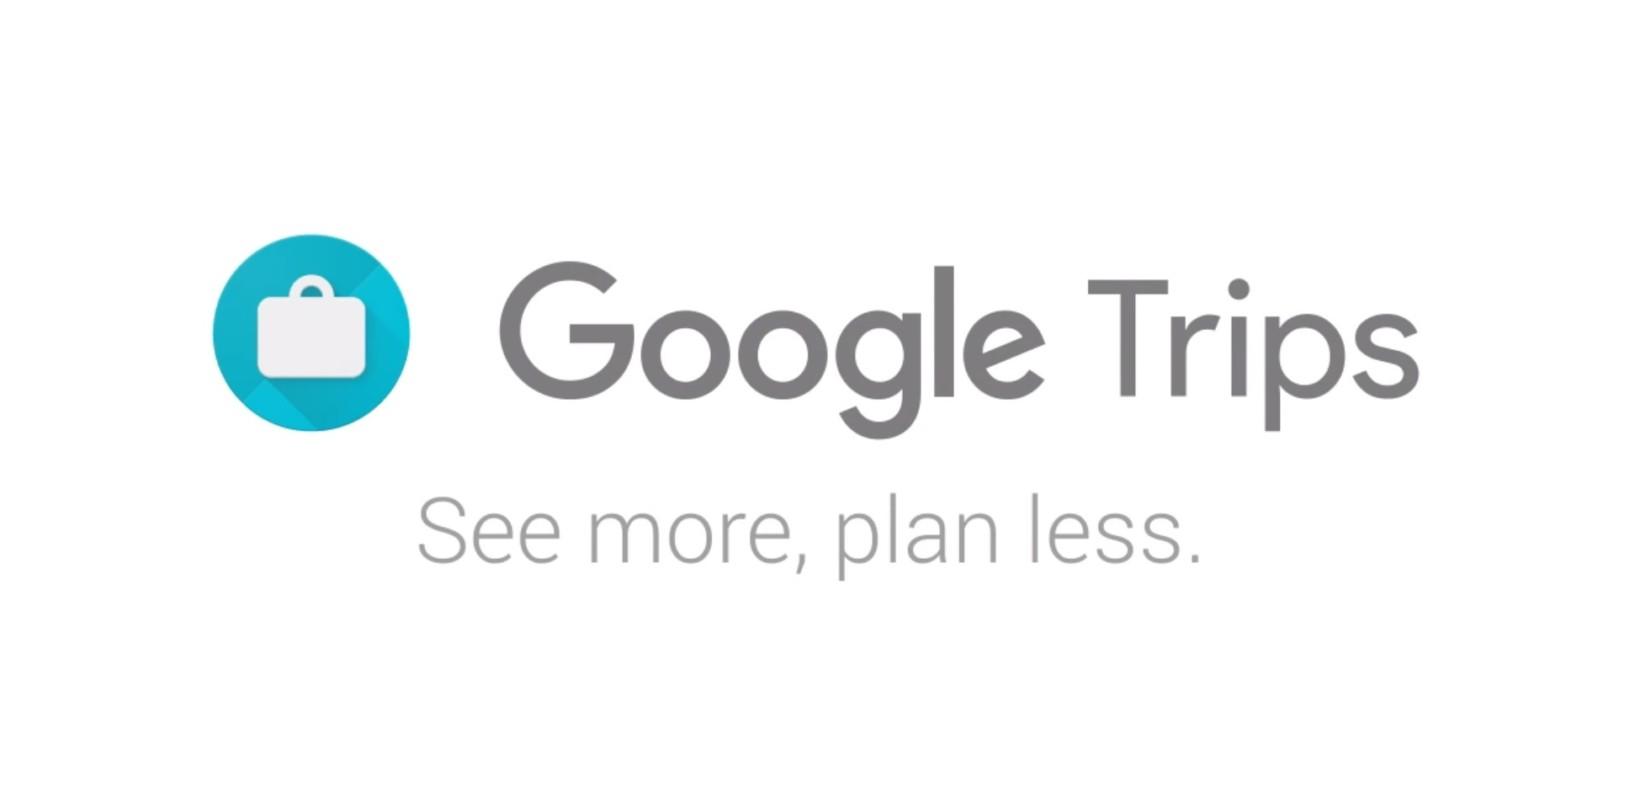 اپلیکیشن گوگل تریپس | Google Trips